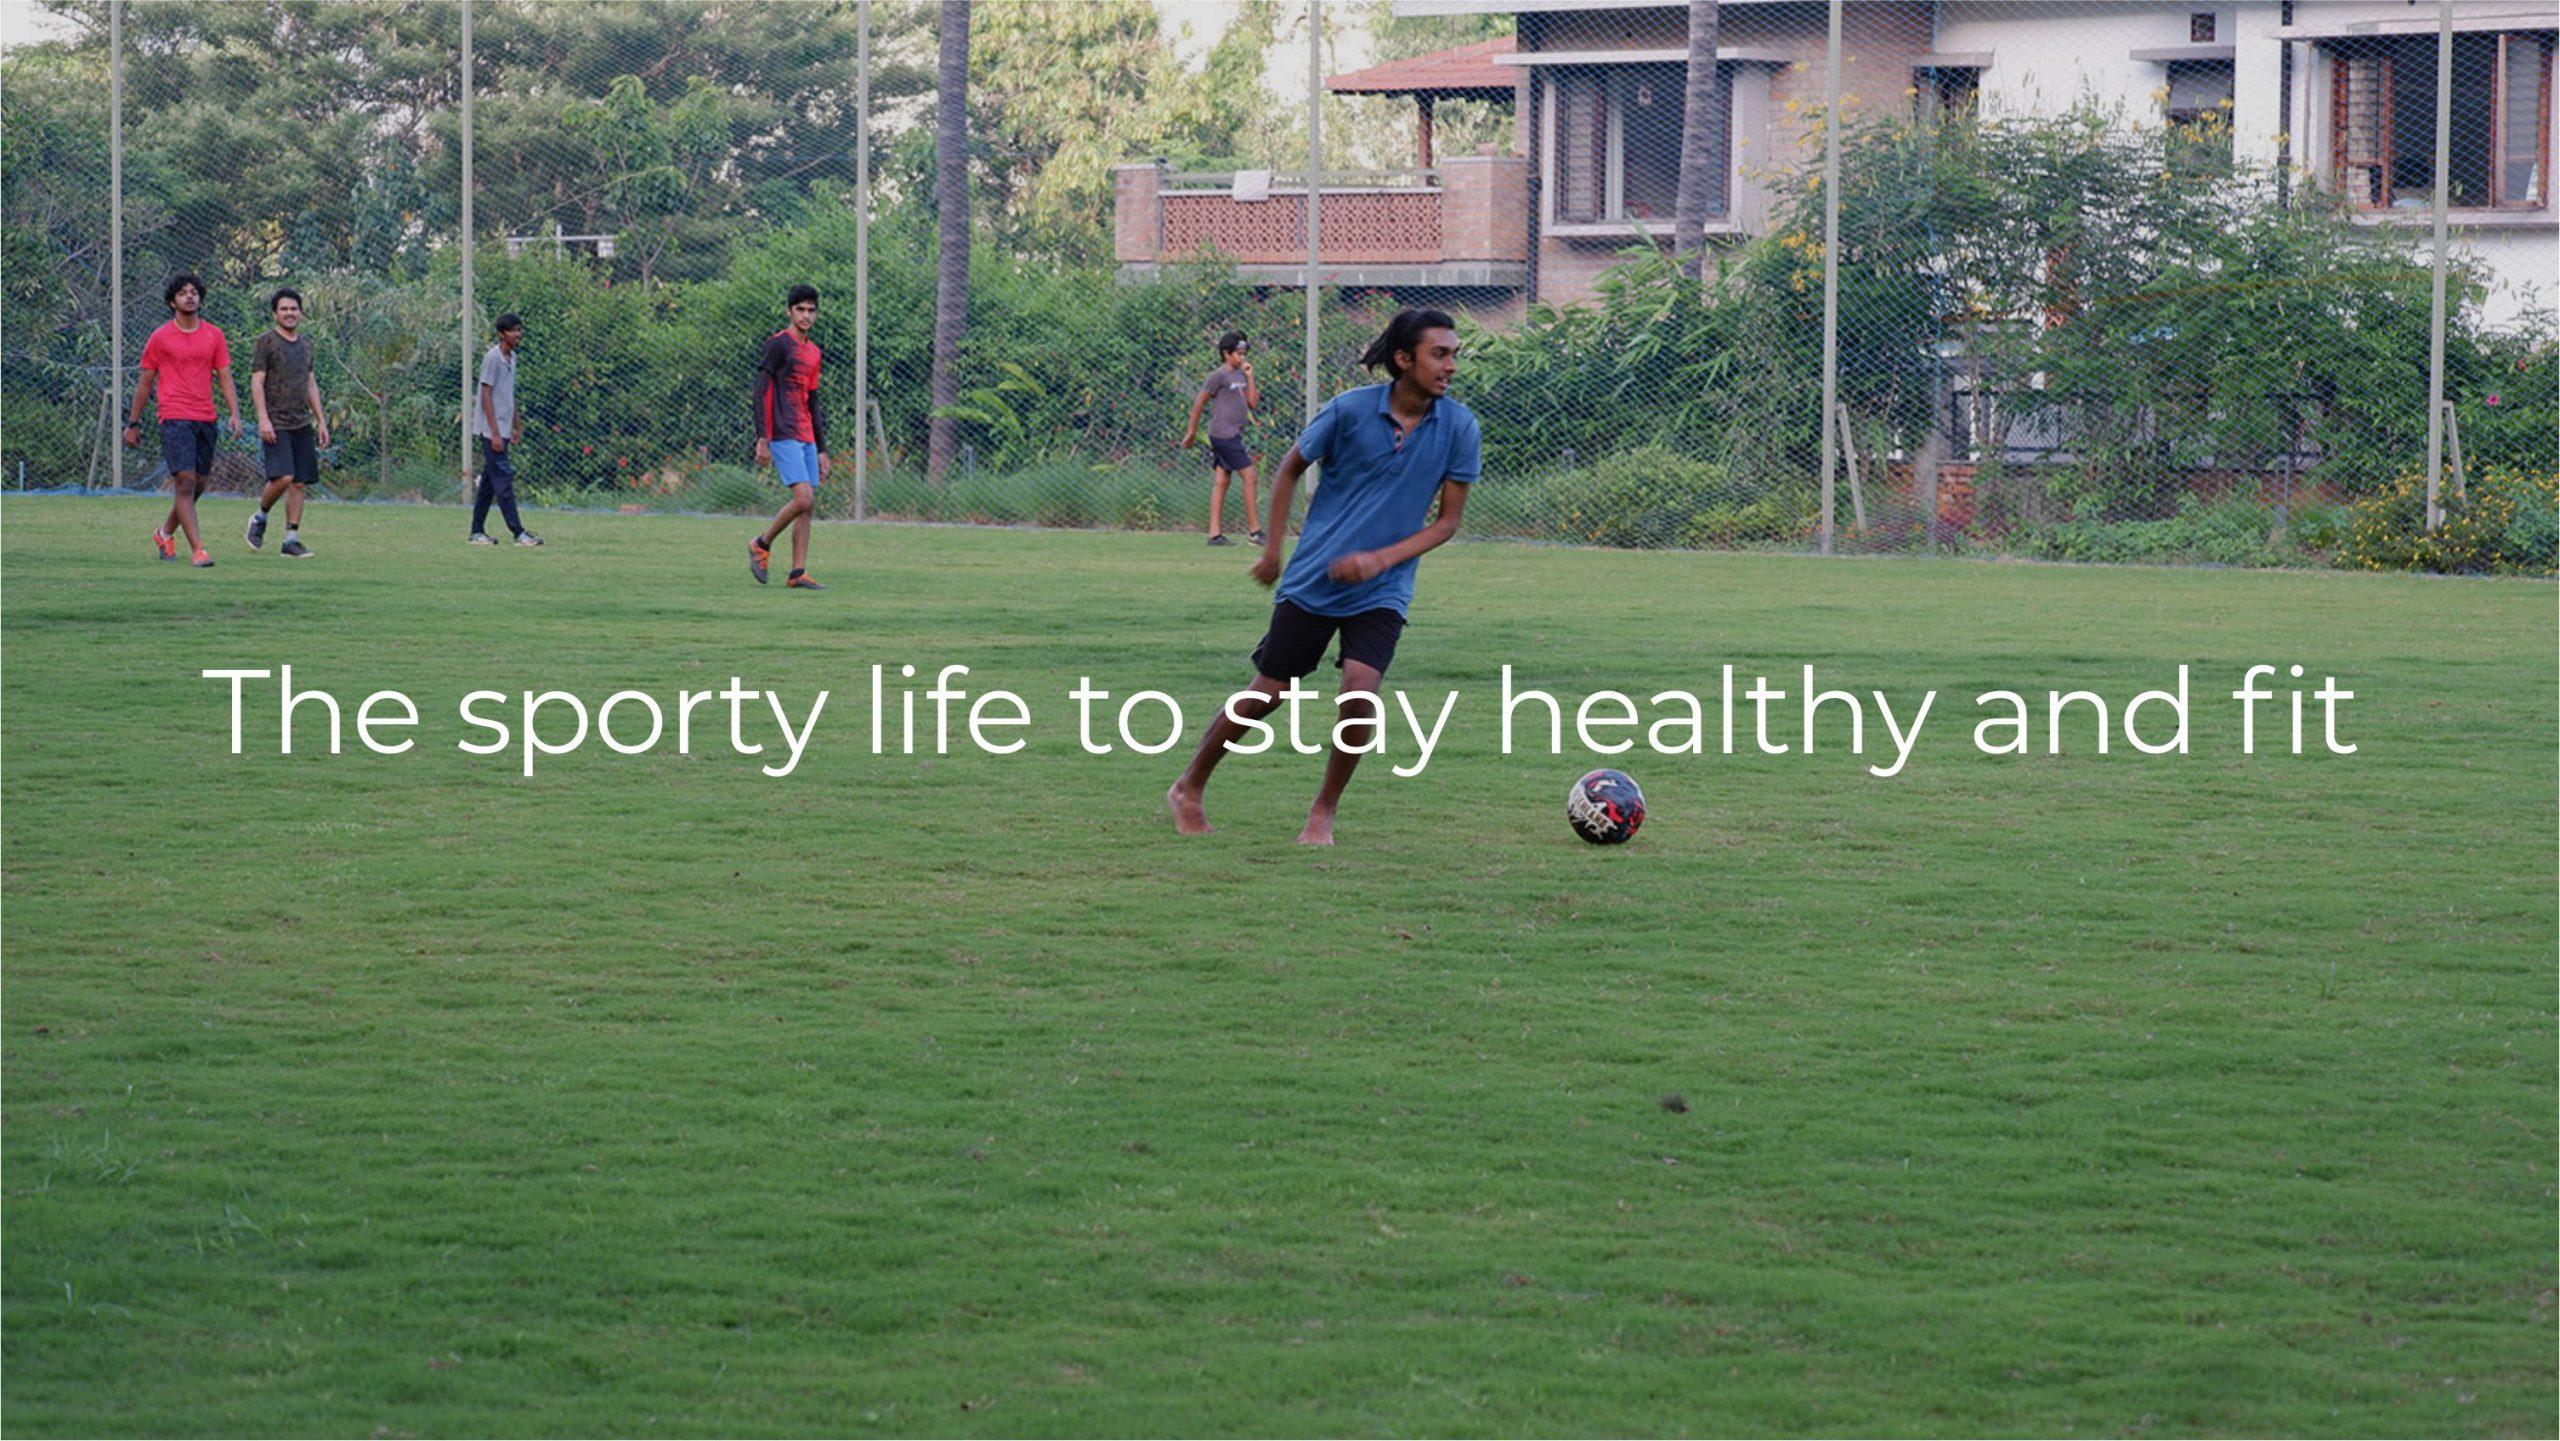 sports-and-welness-image